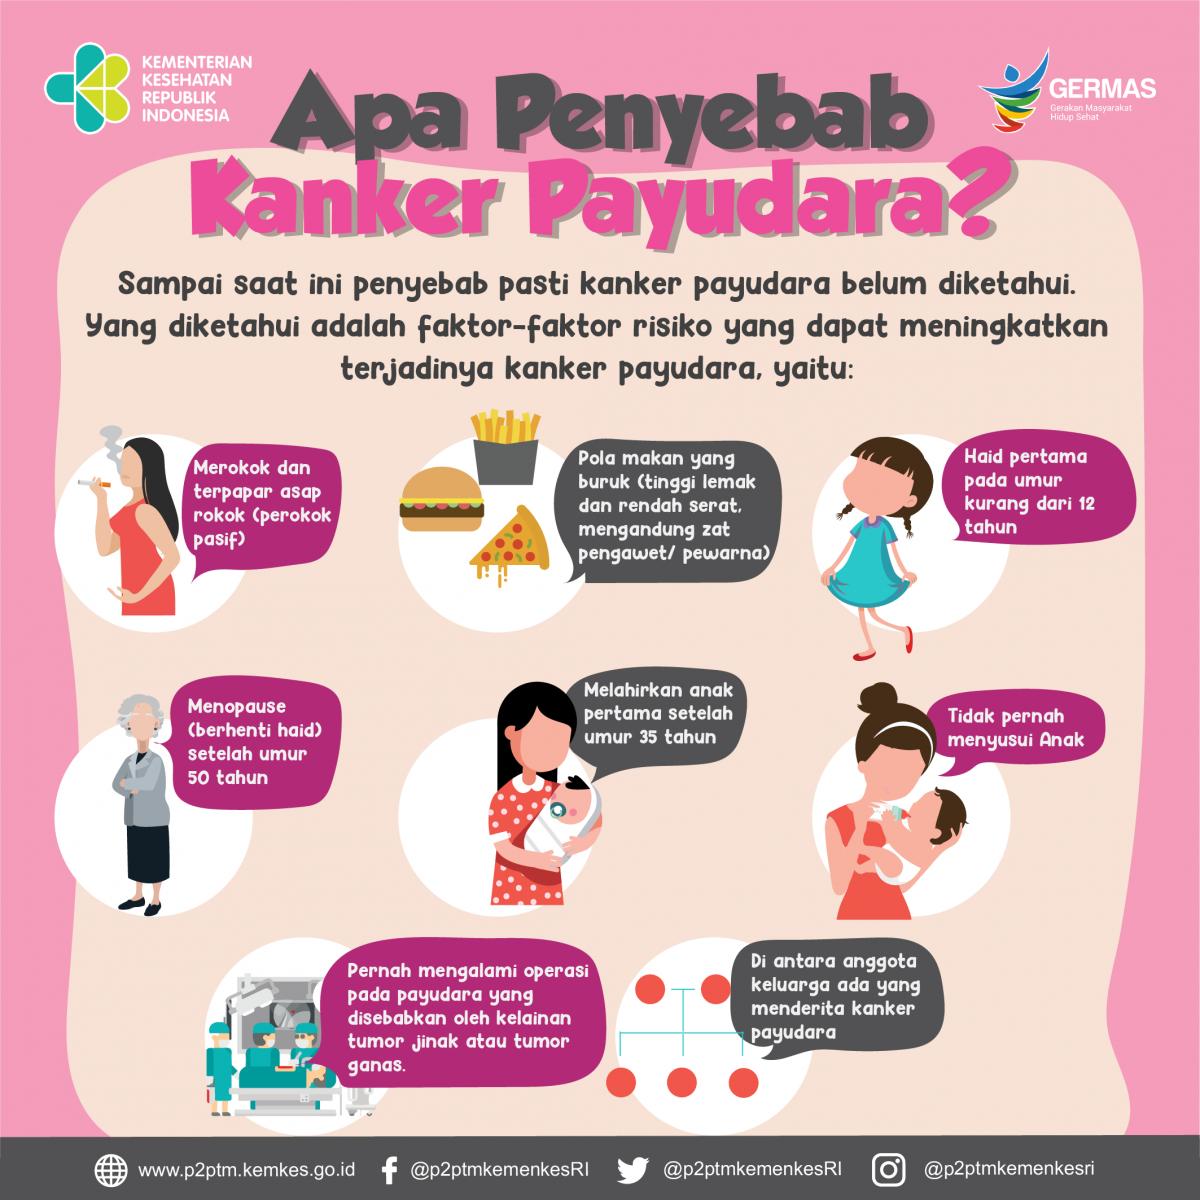 Apa Penyebab Kanker Payudara? - Direktorat P2PTM